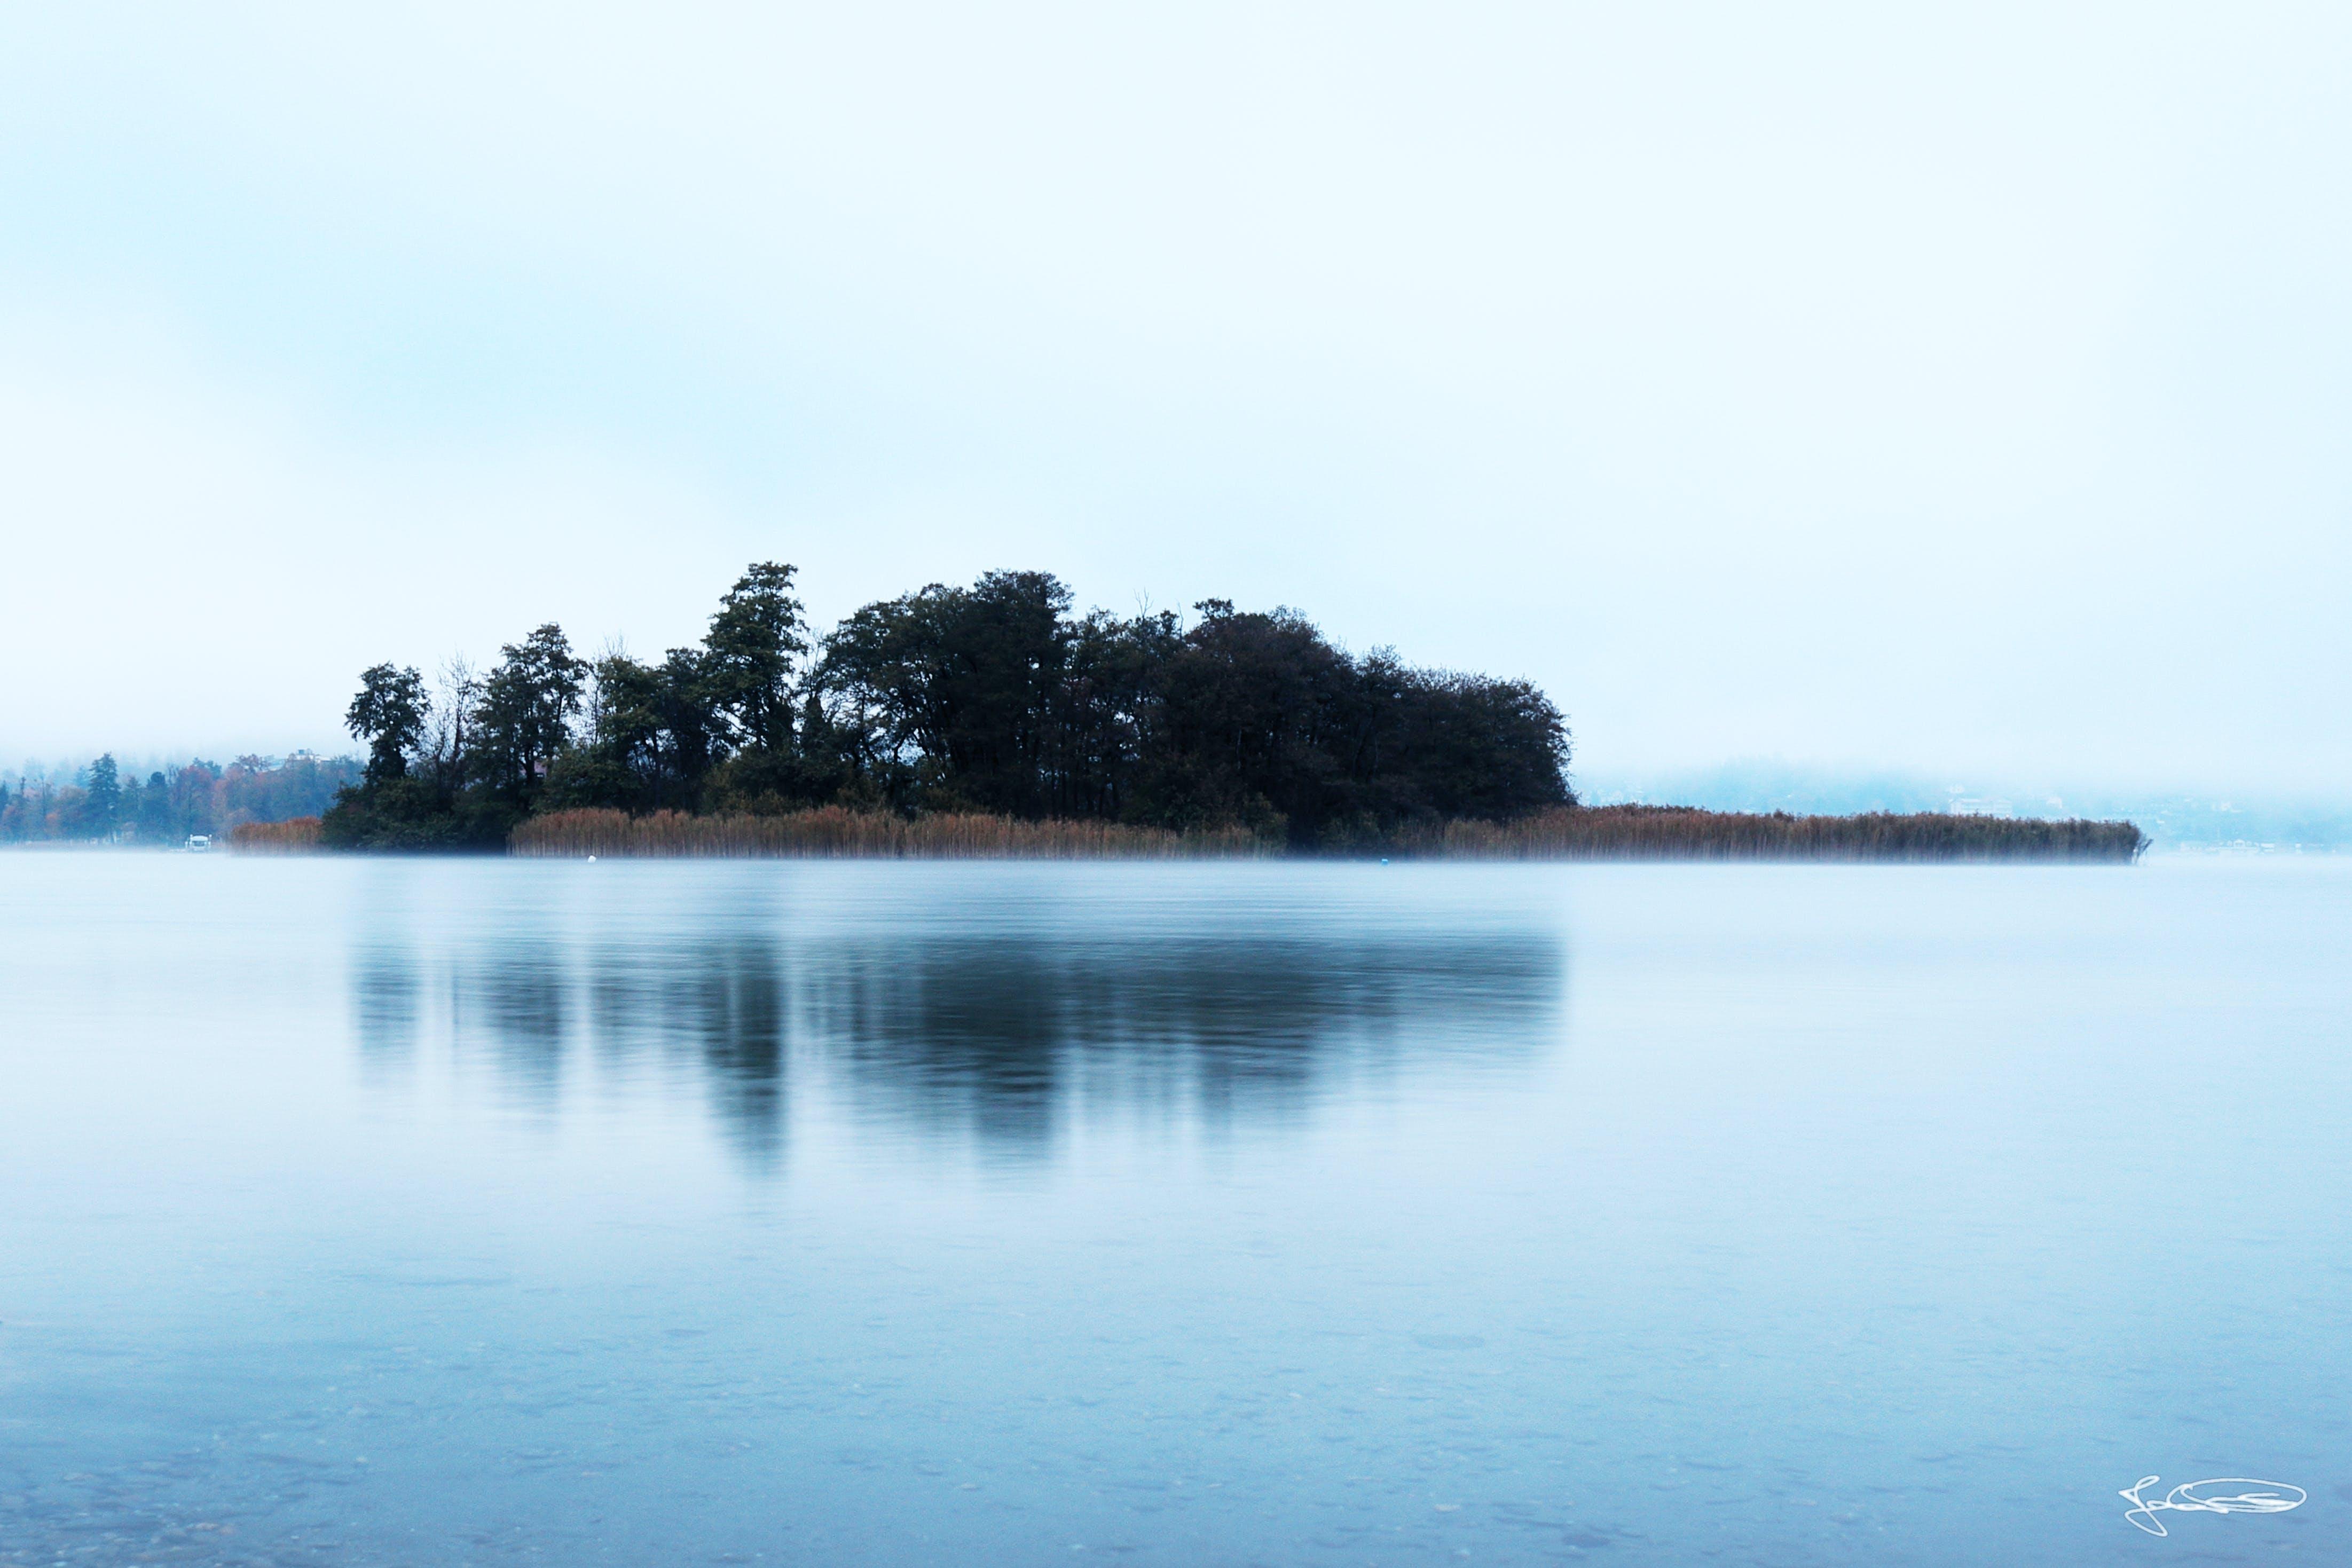 Fotos de stock gratuitas de agua, arboles, bosque, con neblina